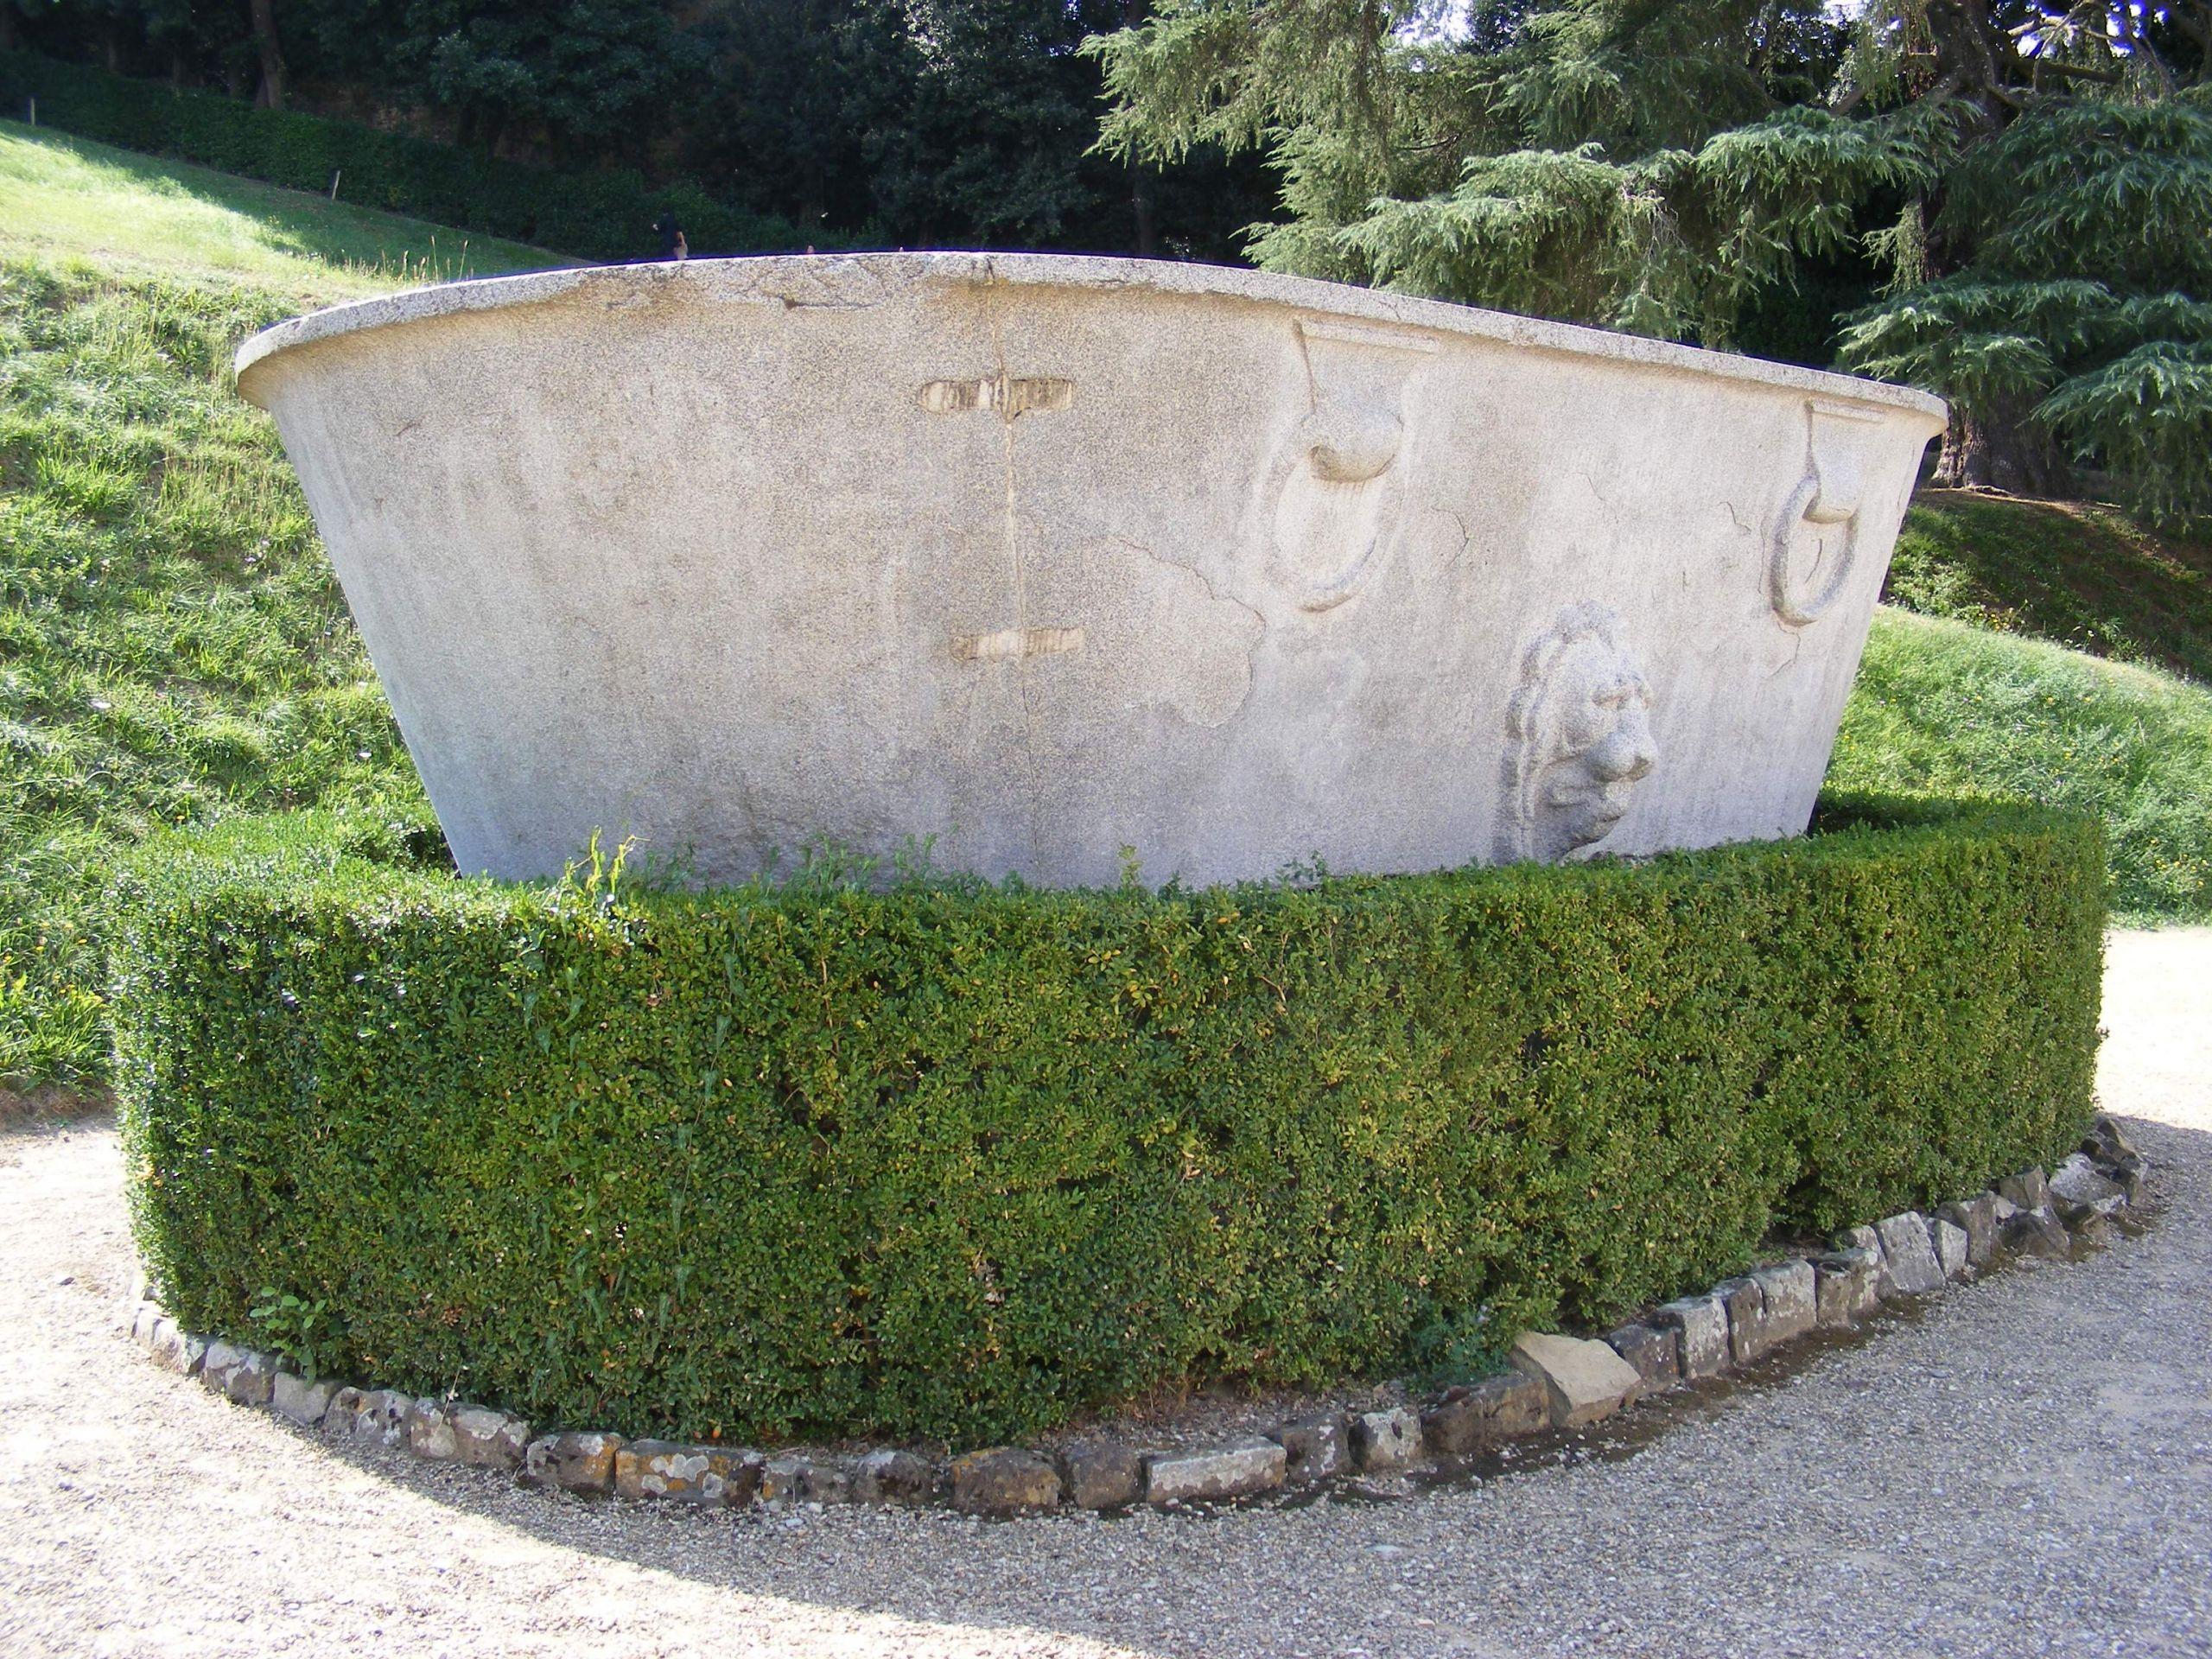 Florenz Giardino di Boboli Große steinerne Wanne